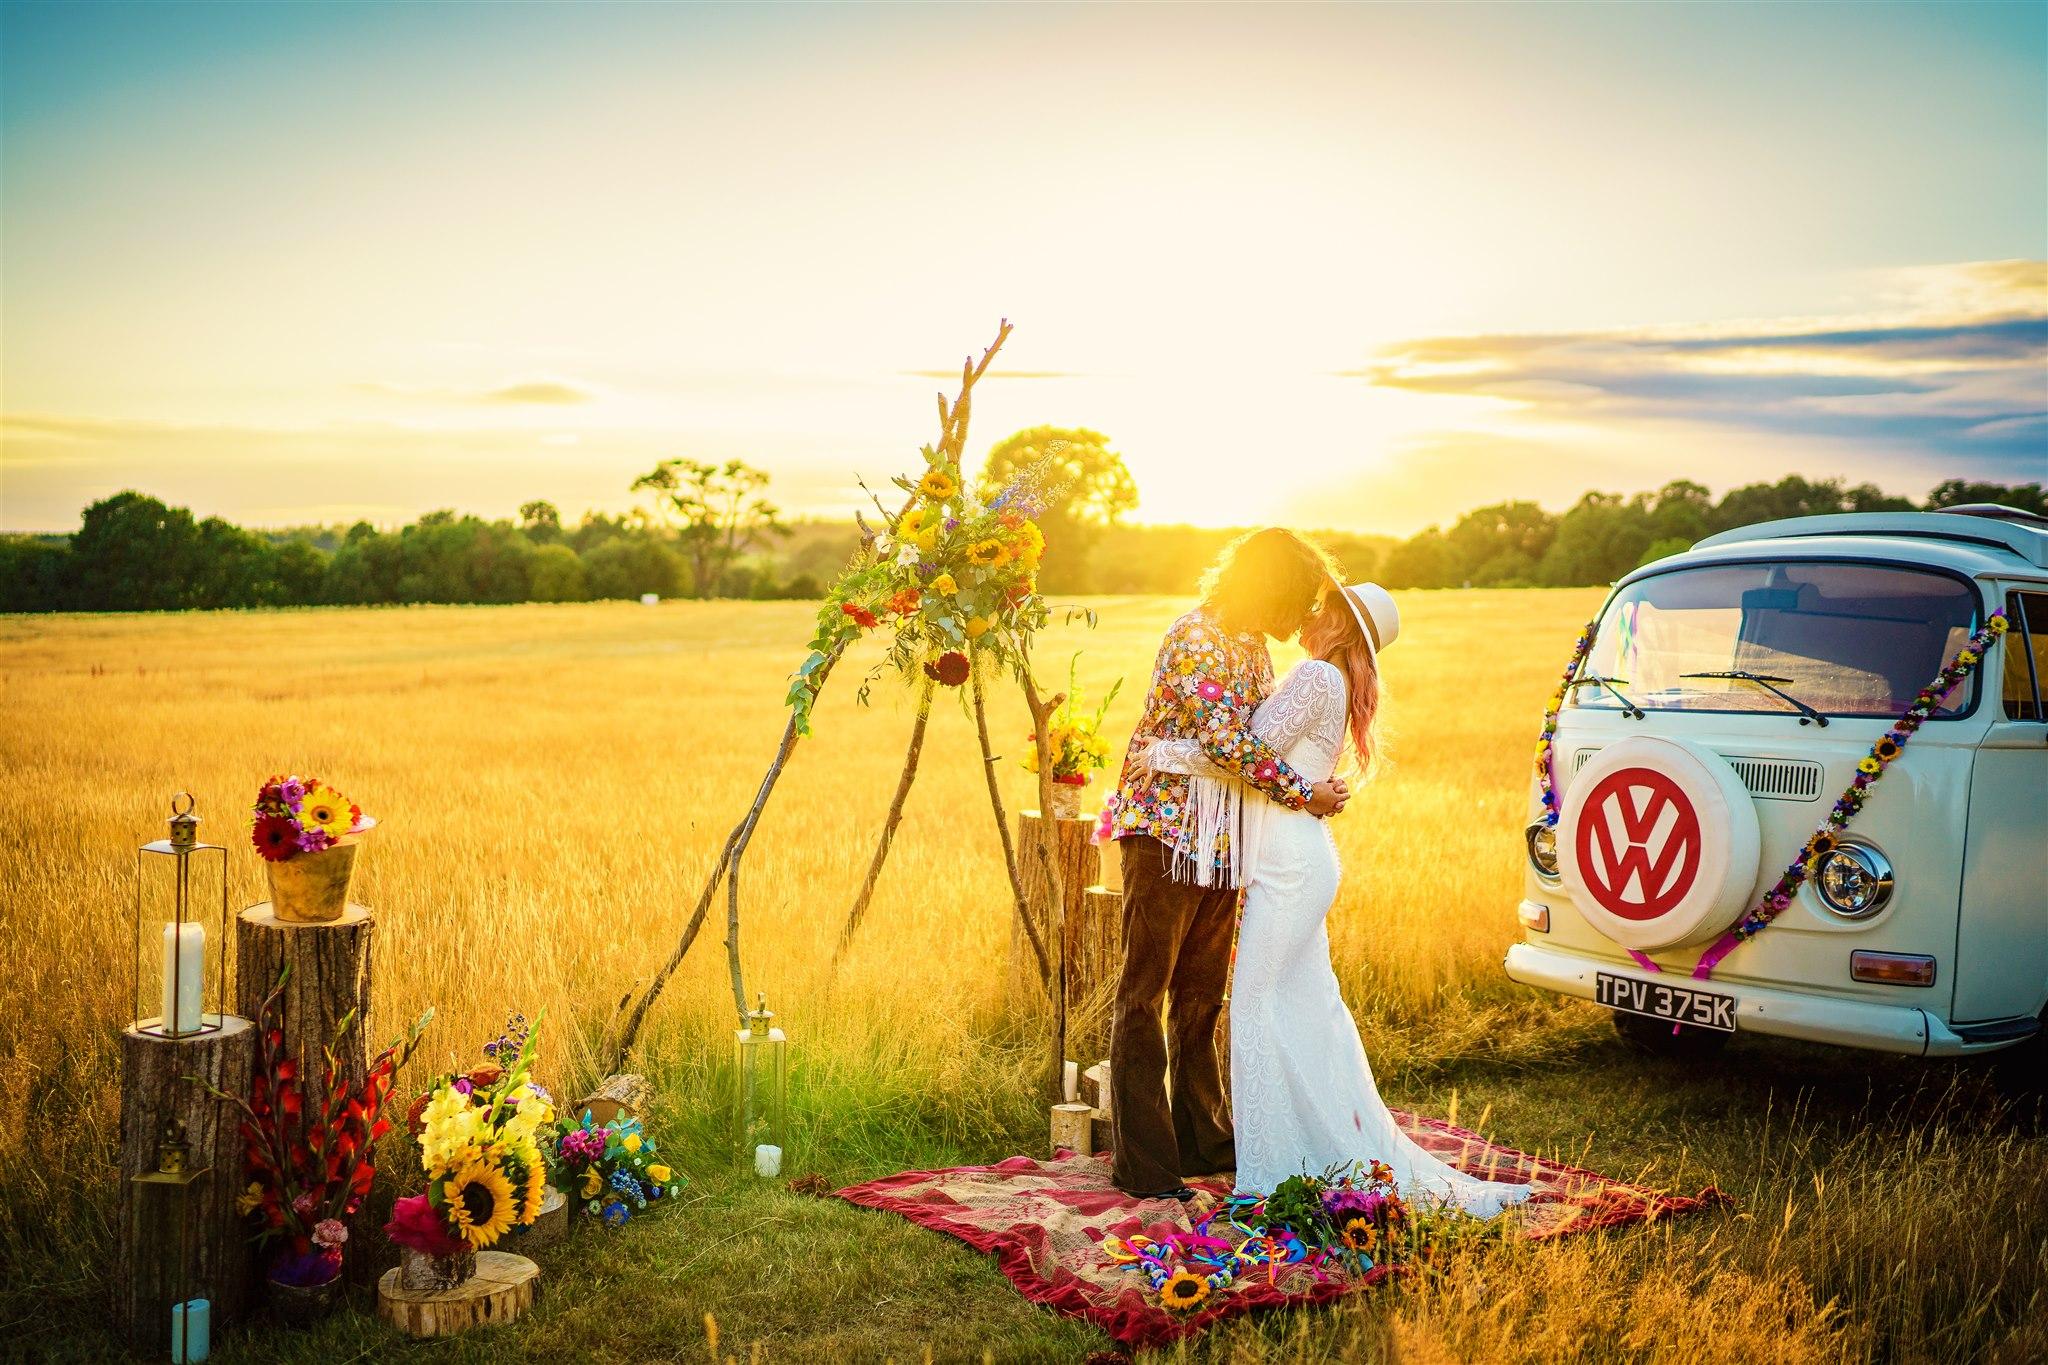 colourful bohemian wedding - 70s wedding - campervan wedding - hippie wedding - dreamy wedding photos